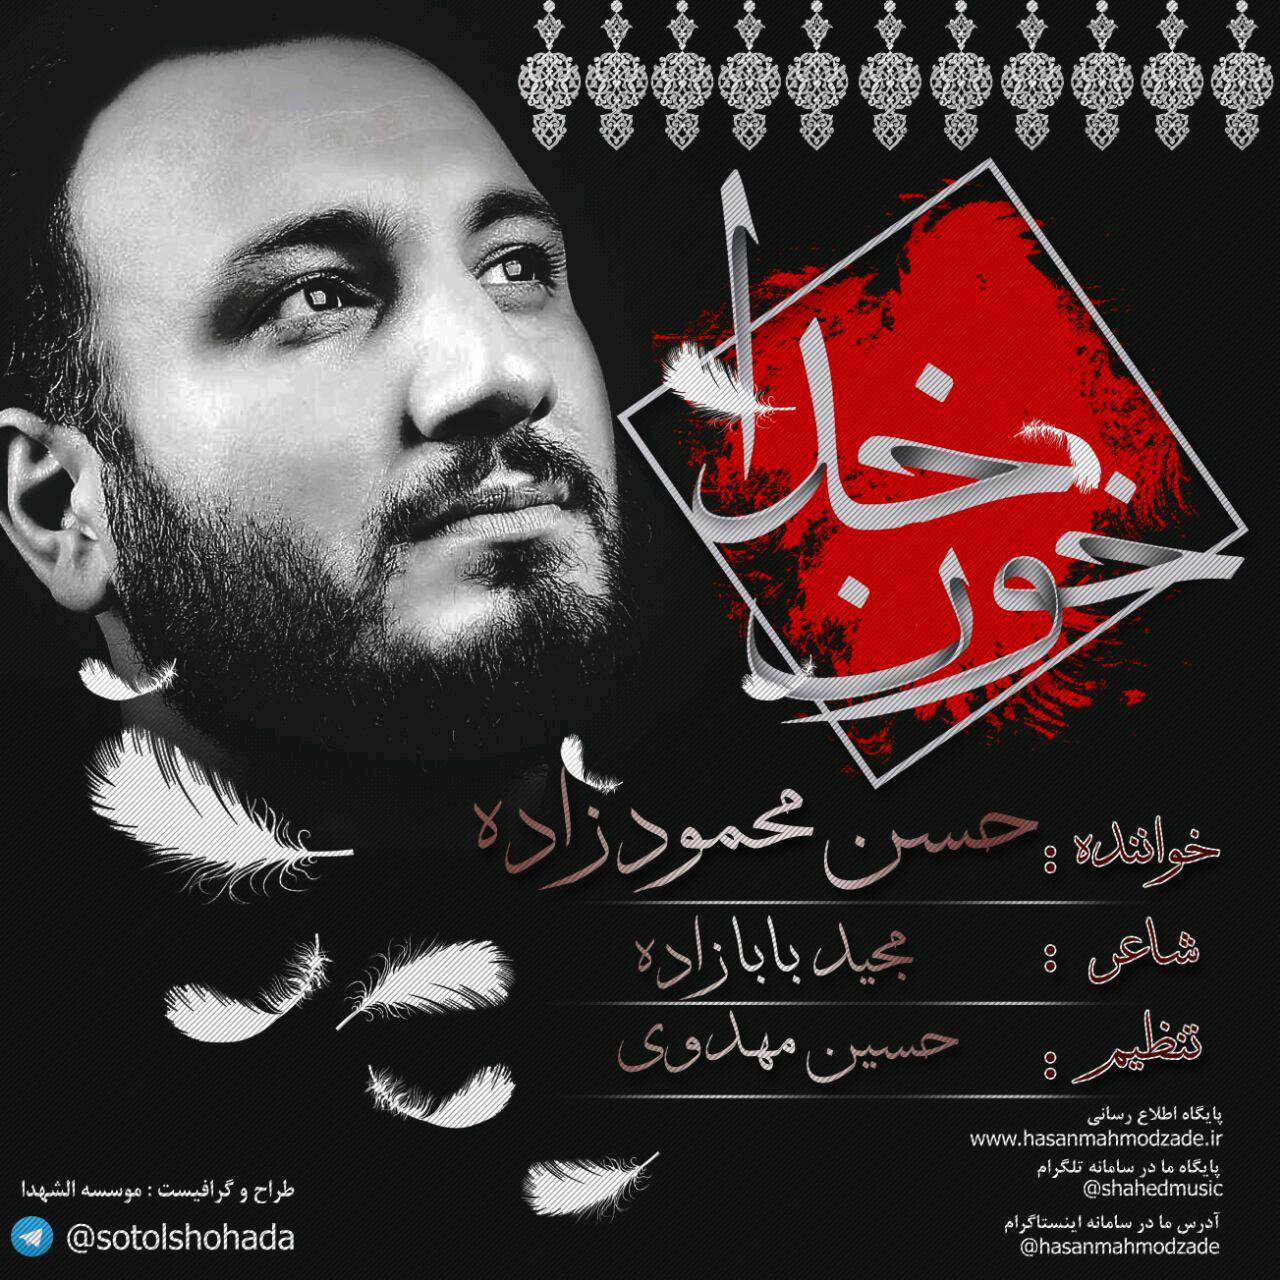 Hasan Mahmodzadeh – Khone Khoda